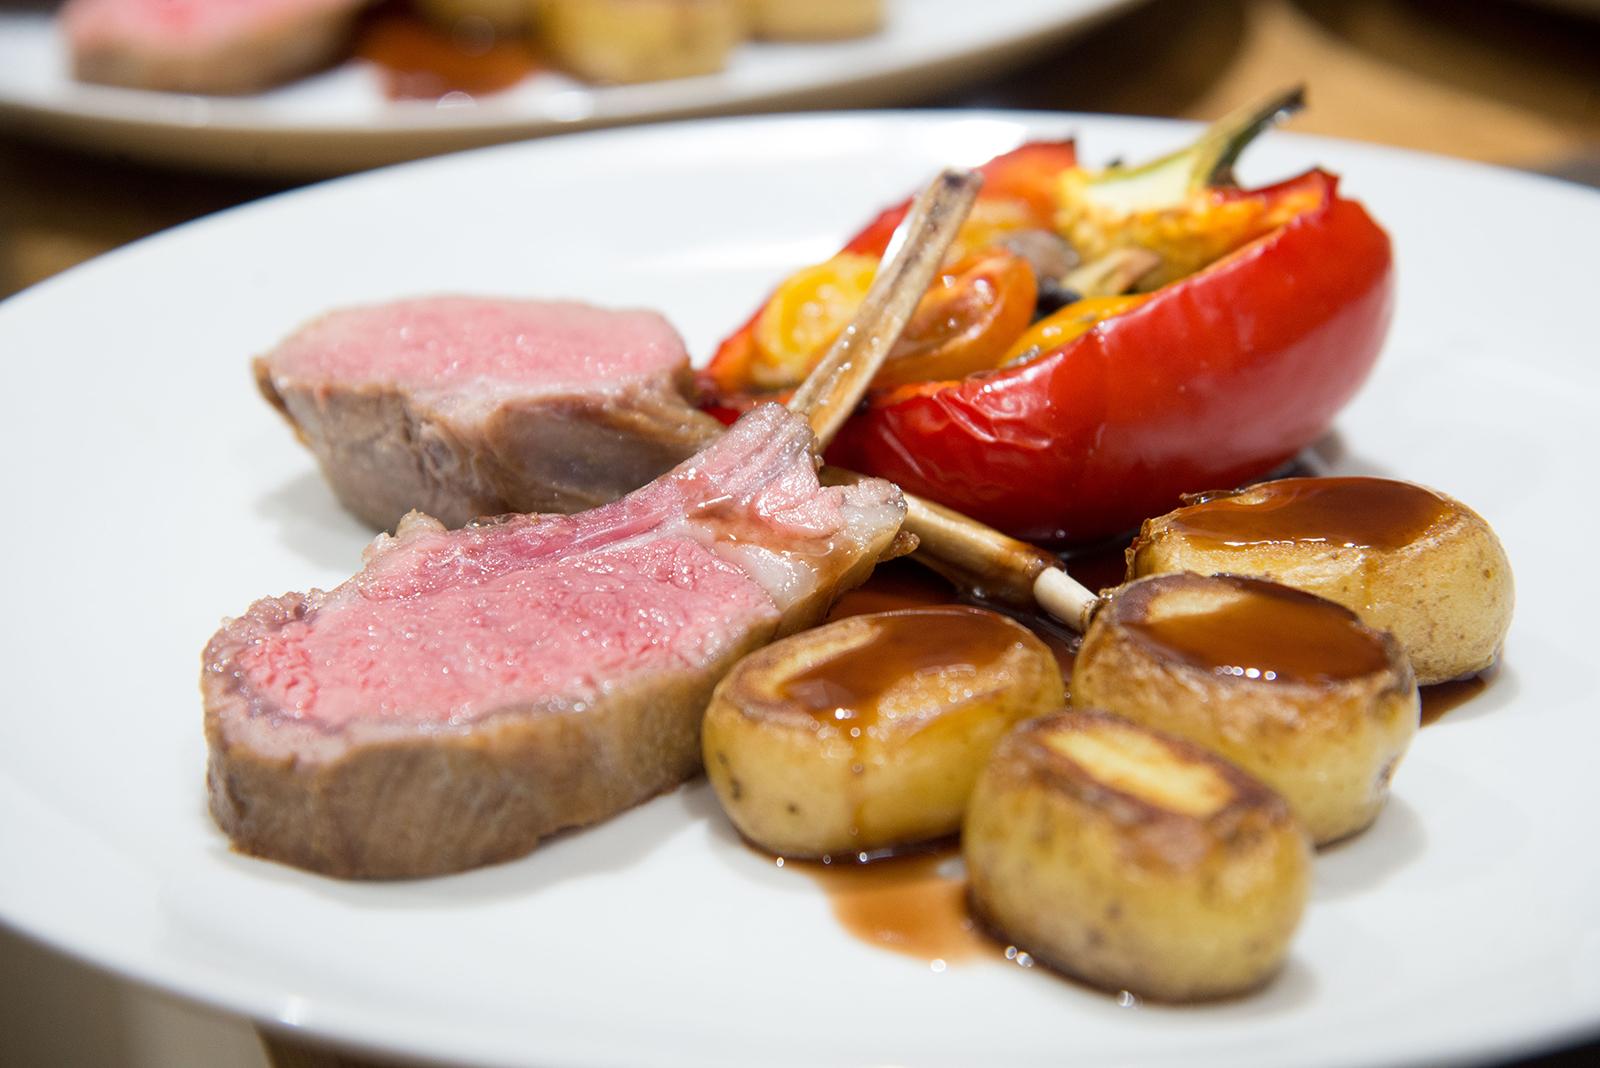 10 Tips To Improve Your Plate Presentation La Belle Assiette Blog